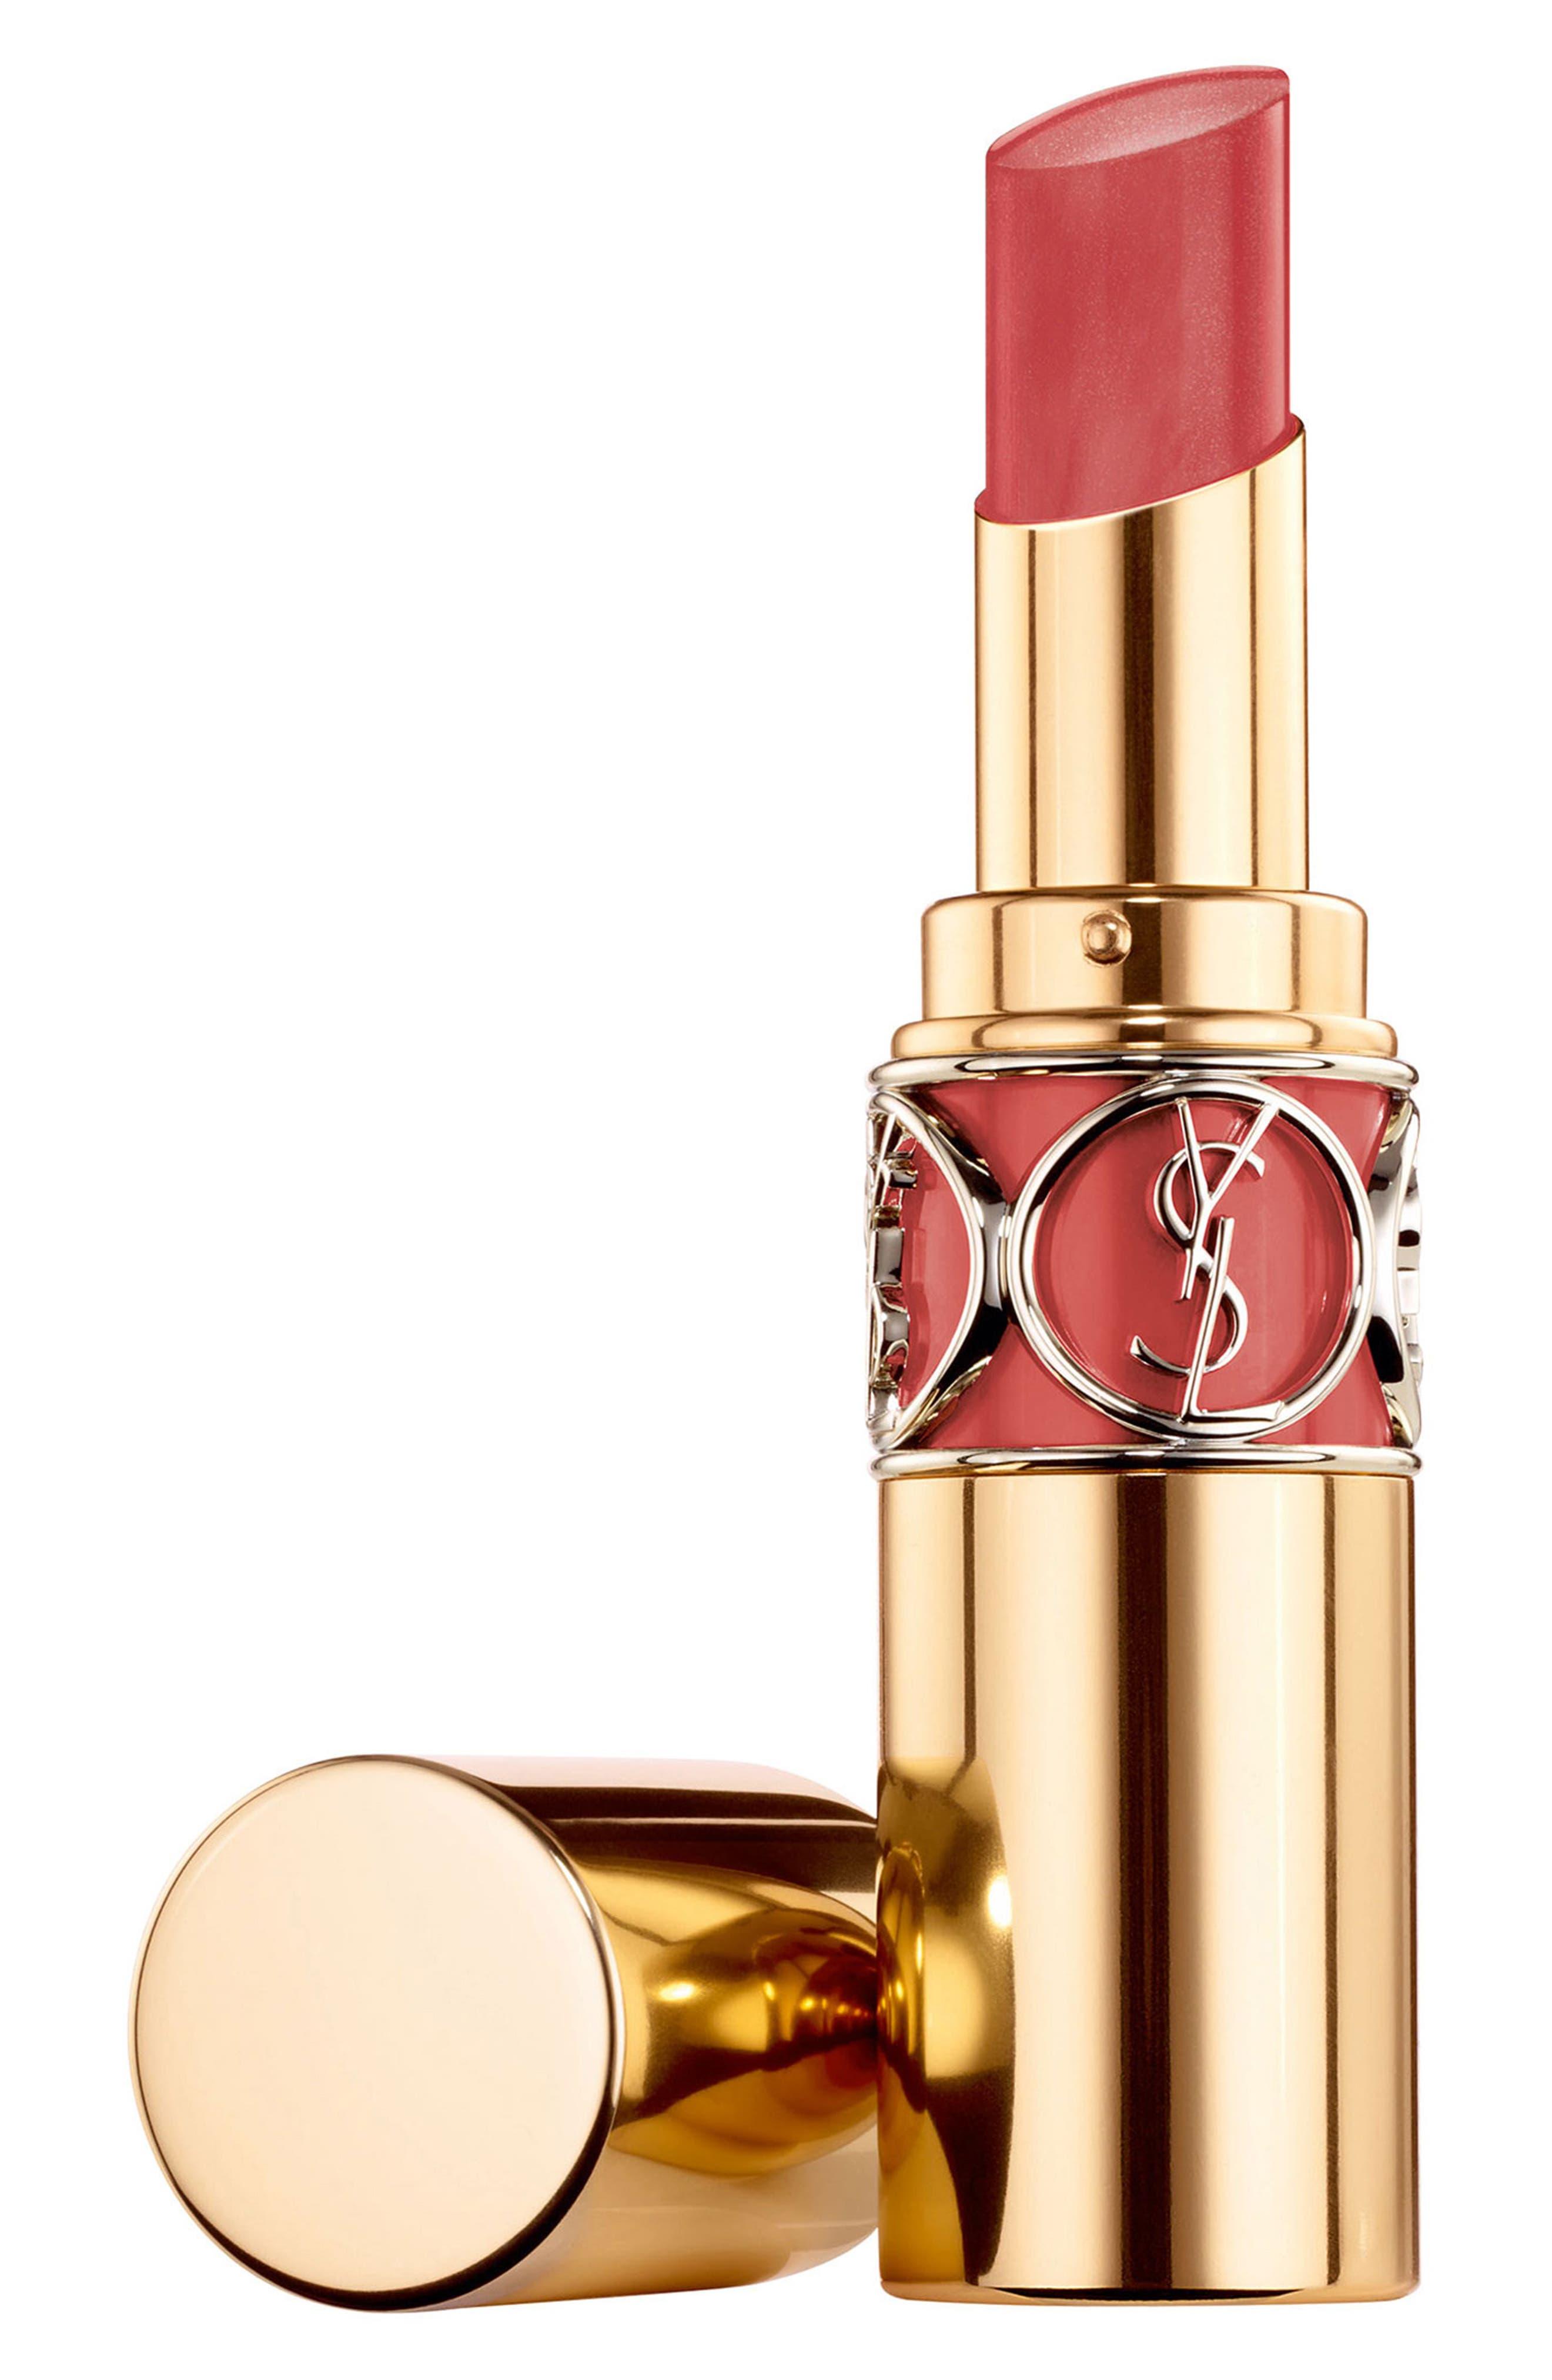 Yves Saint Laurent Rouge Volupte Shine Oil-In-Stick Lipstick - Mauve Cuir